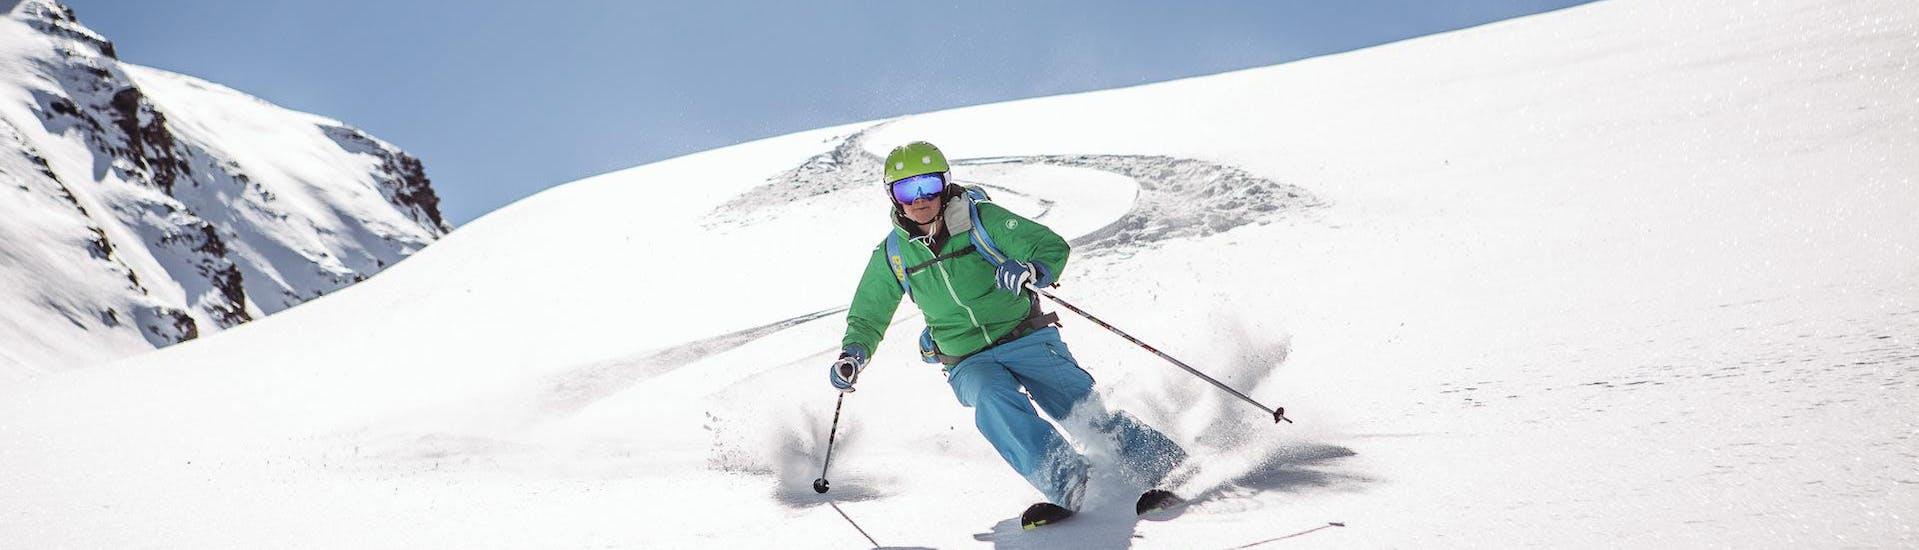 Private Off-Piste Skiing Lessons for All Levels avec Epic Lenzerheide - Hero image